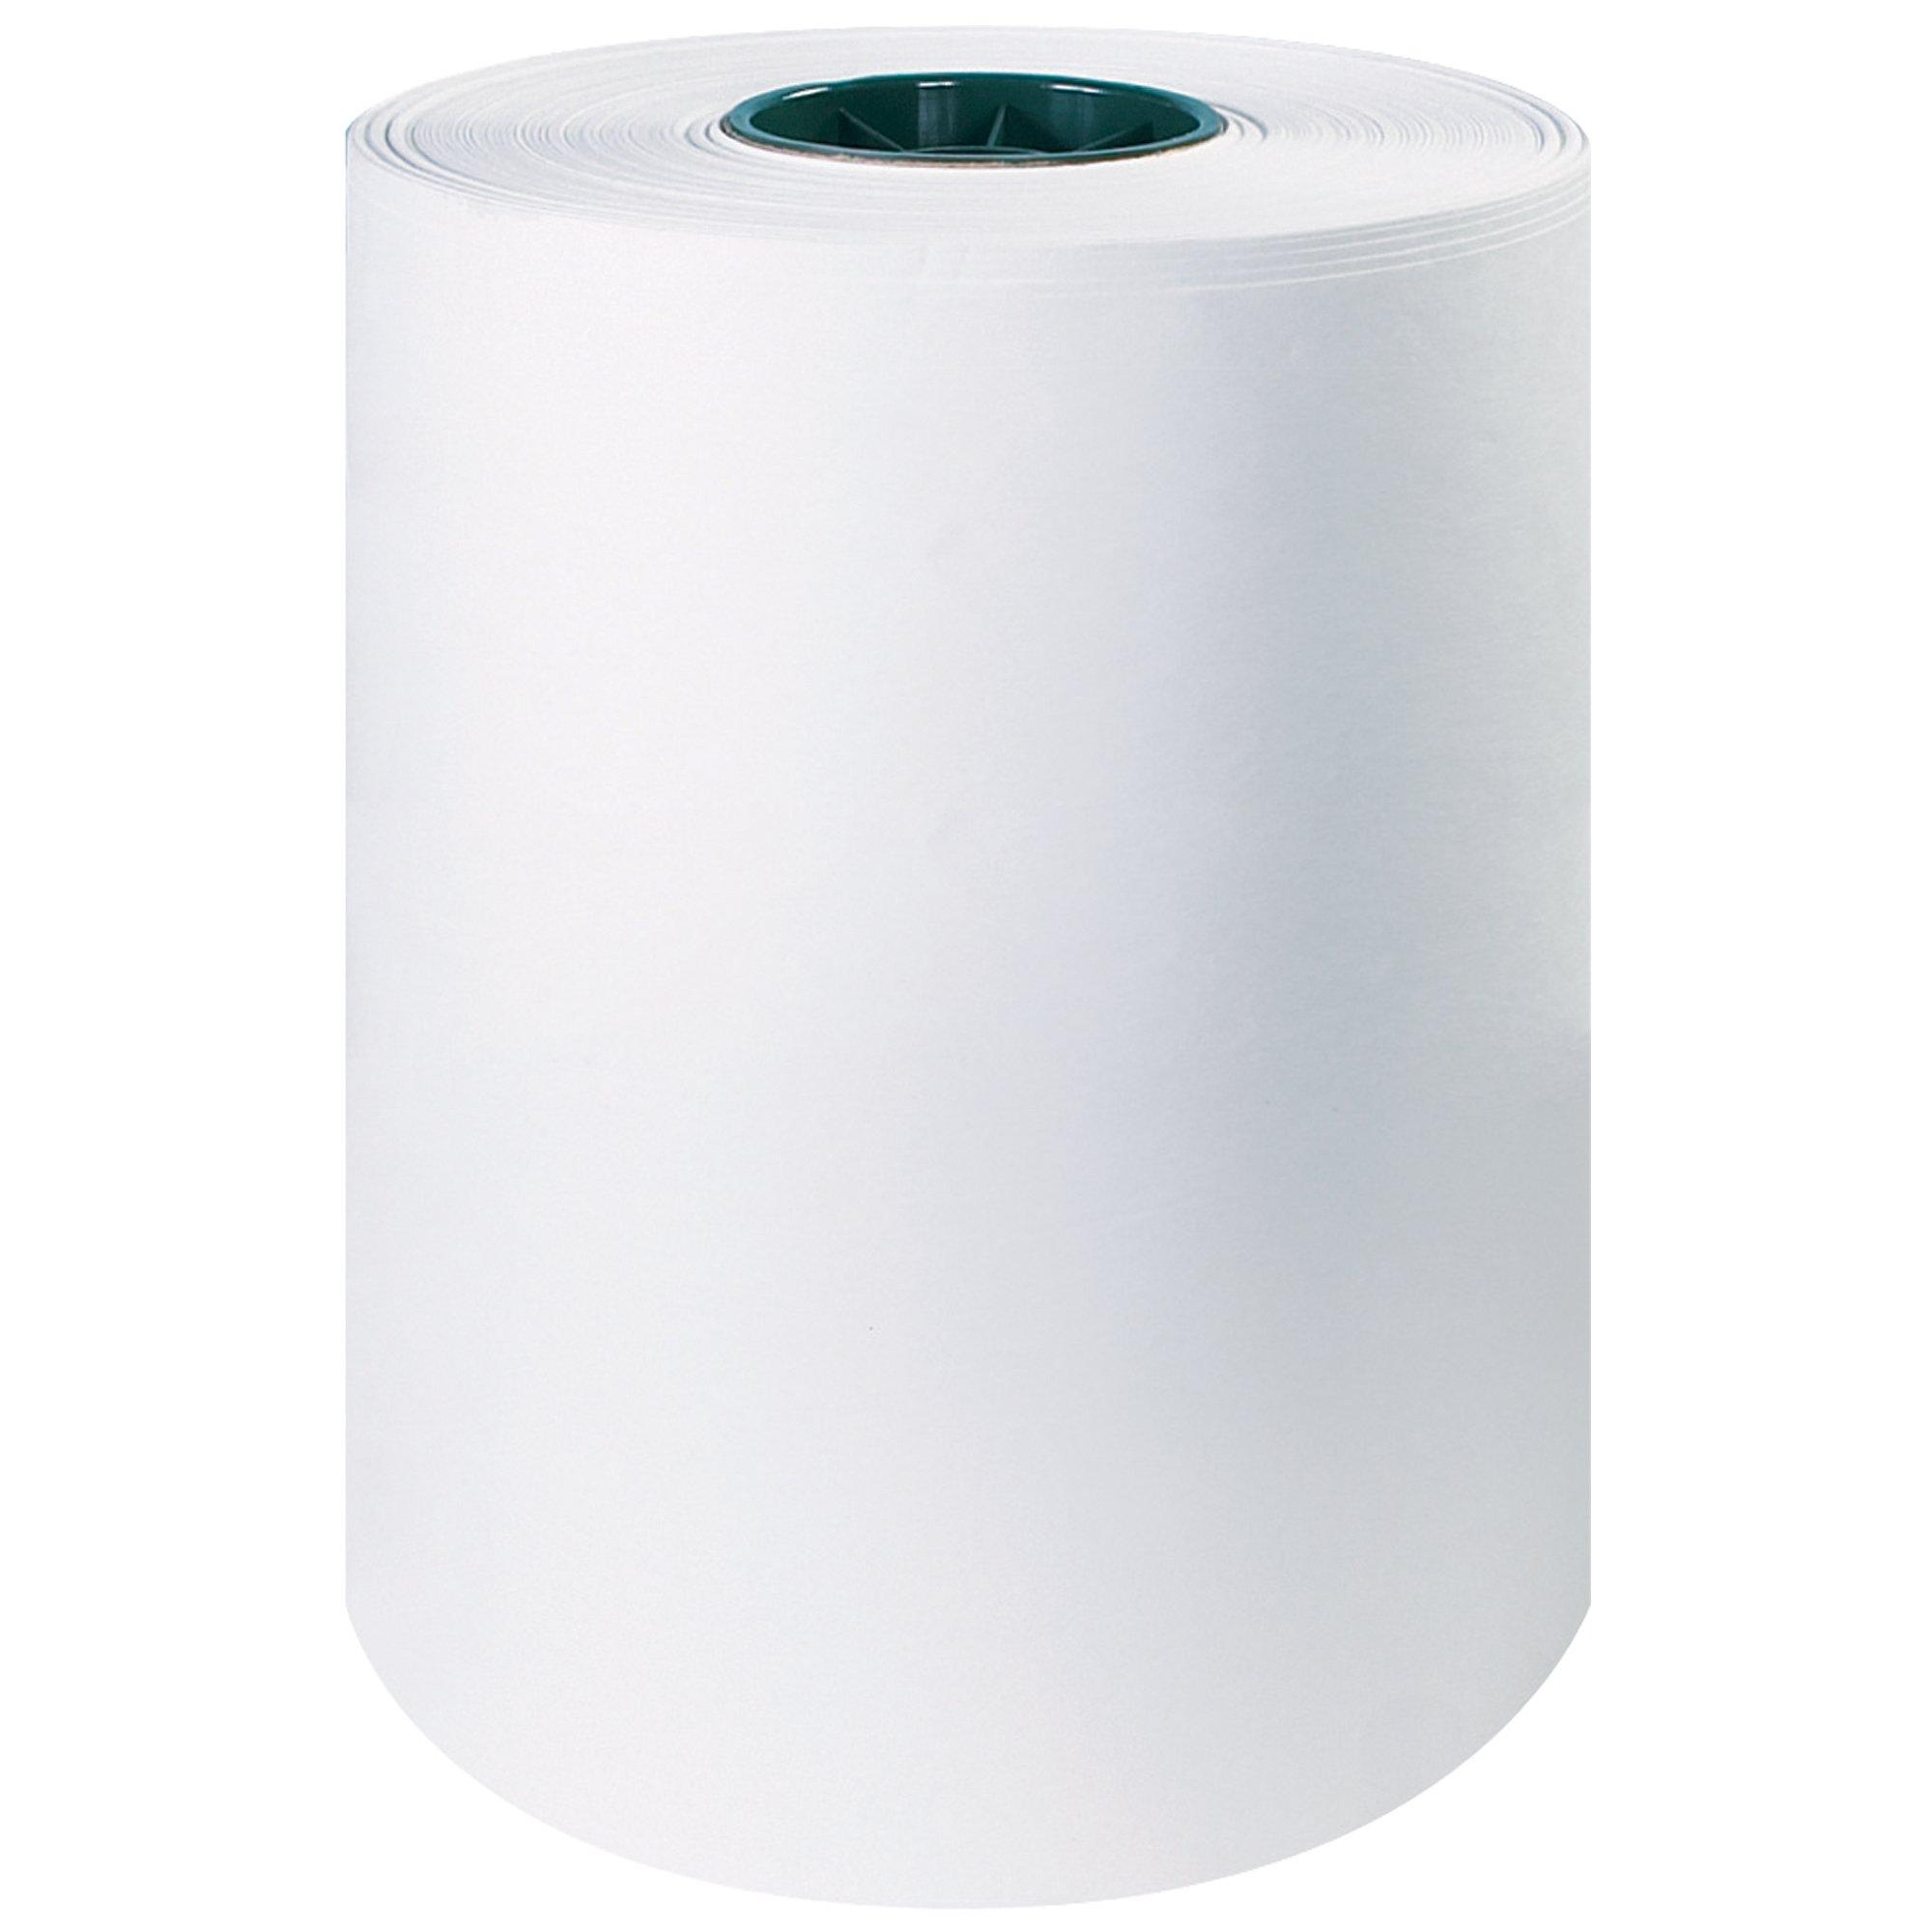 Aviditi BP1240W Butcher Paper Roll, 1000' Length x 12'' Width, White